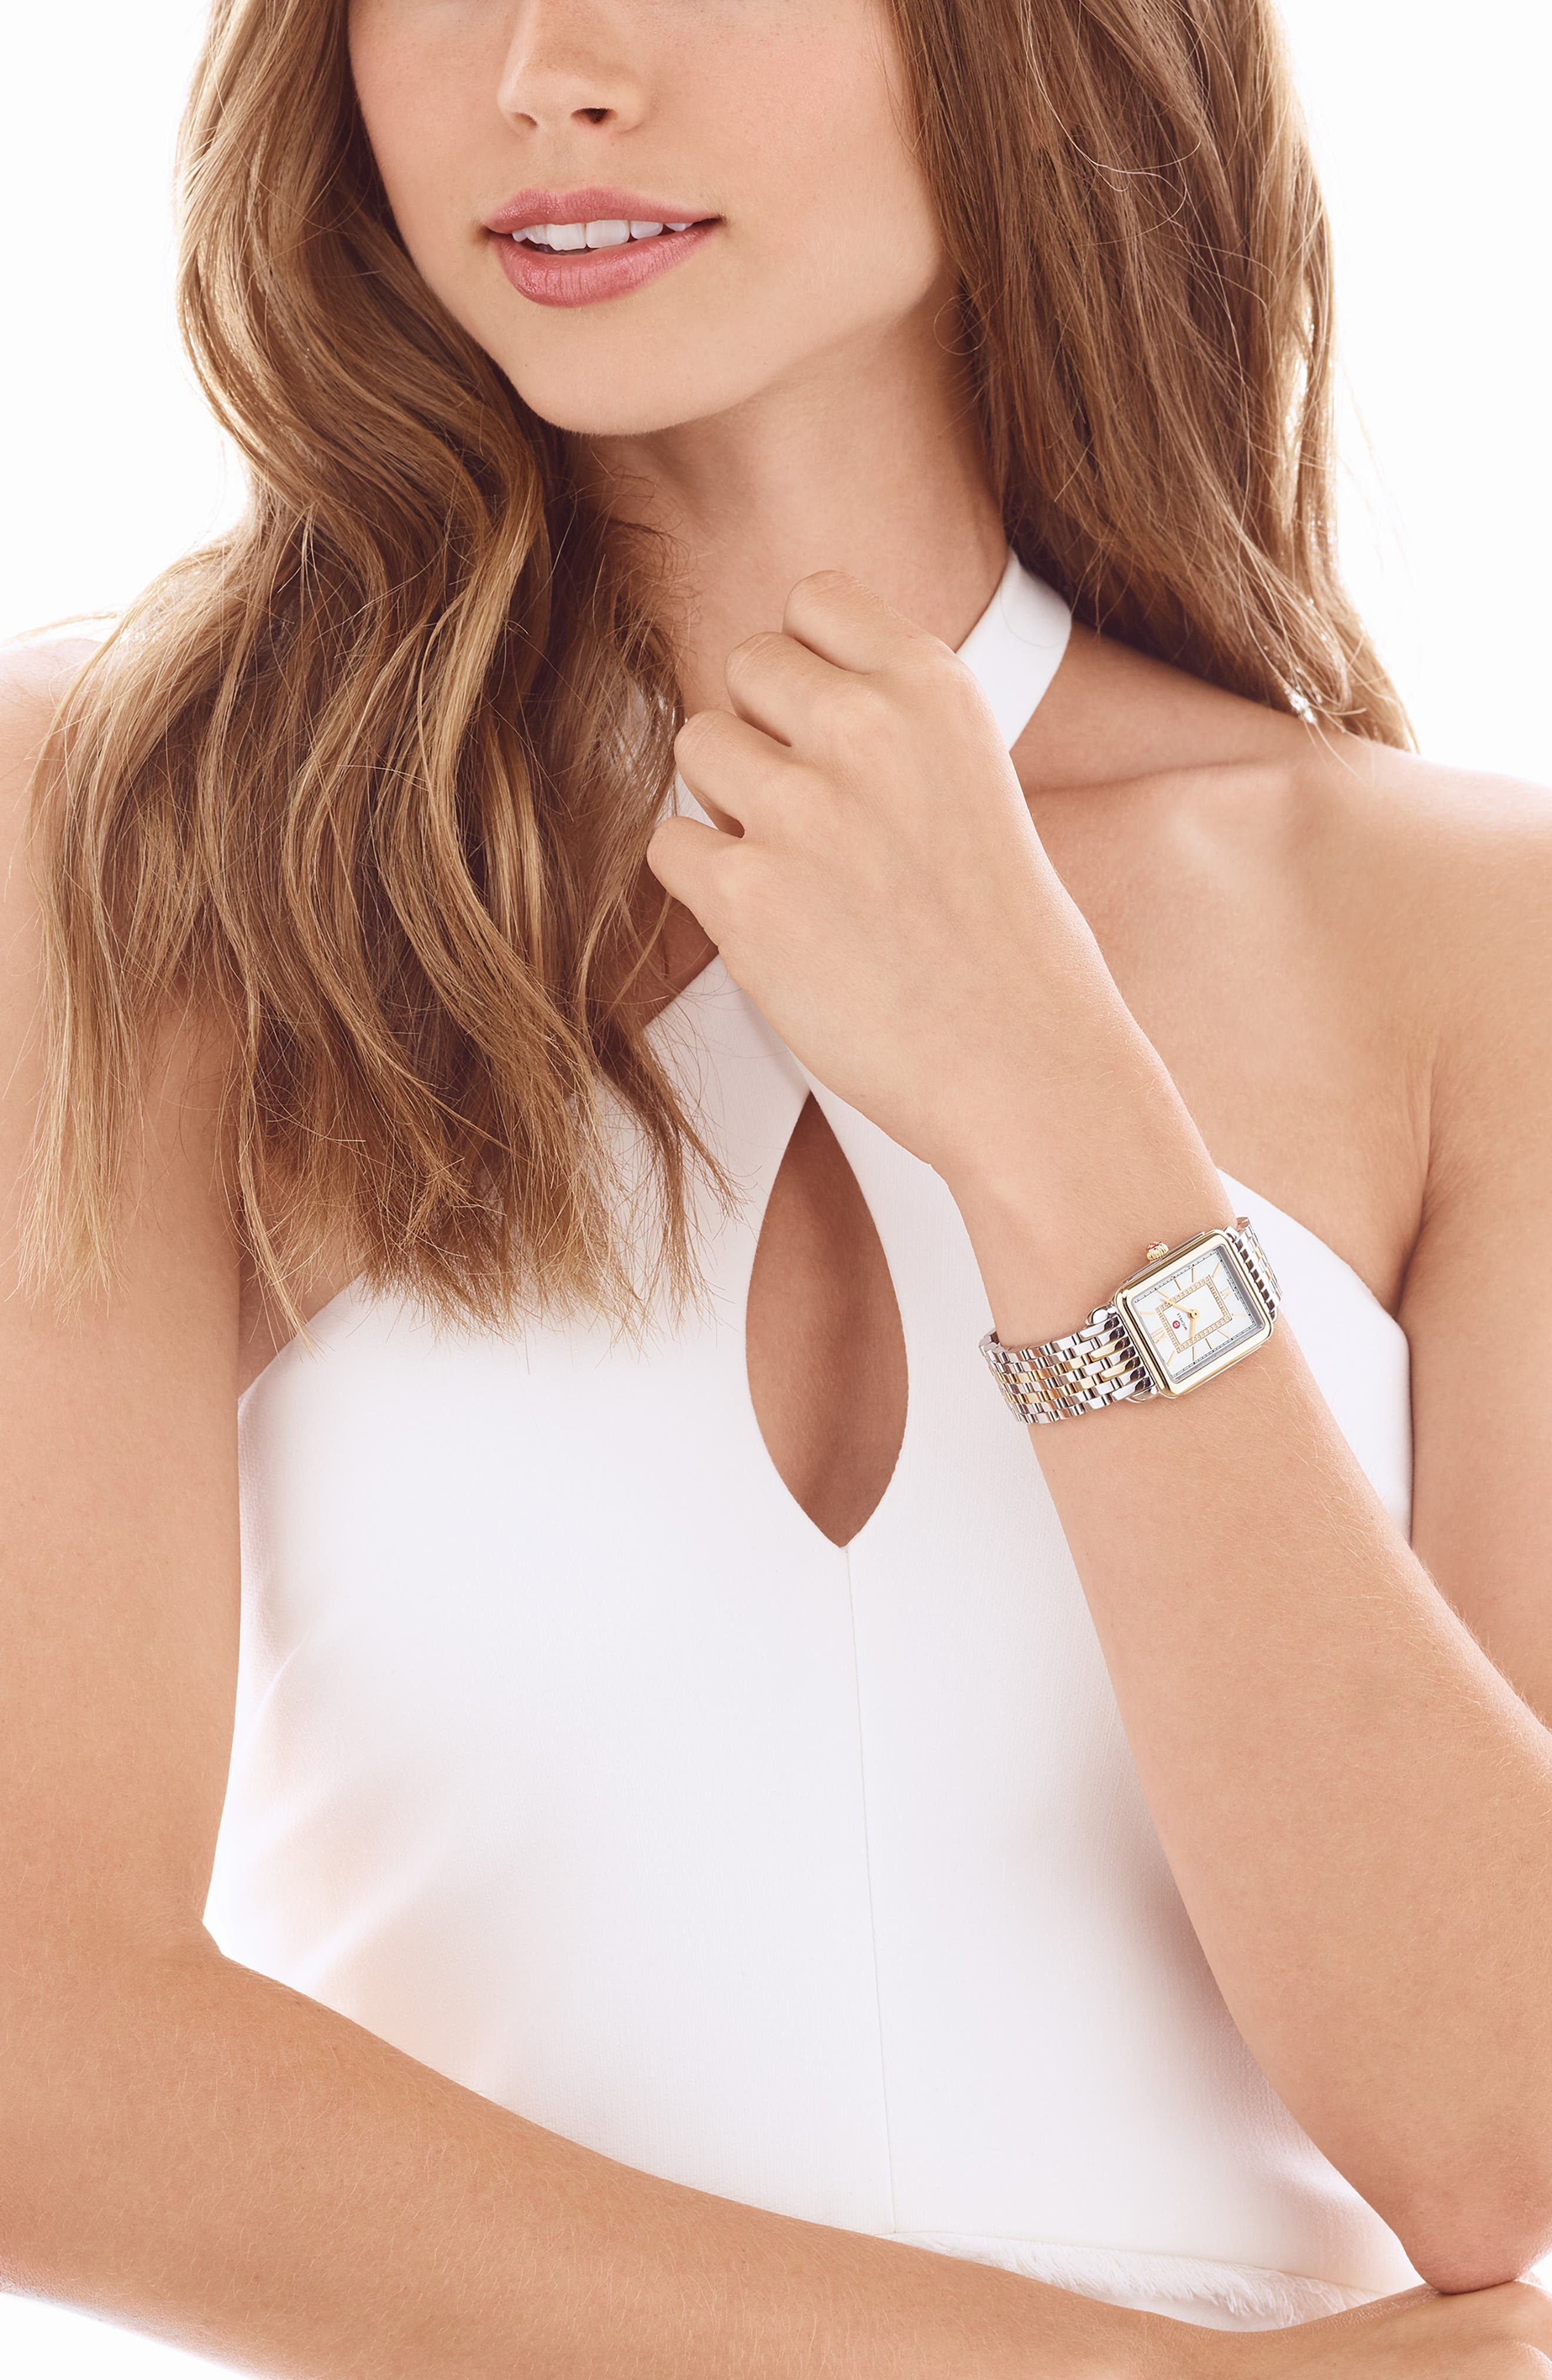 MICHELE, Deco II Mid 16mm Bracelet Watchband, Alternate thumbnail 8, color, SILVER/ GOLD